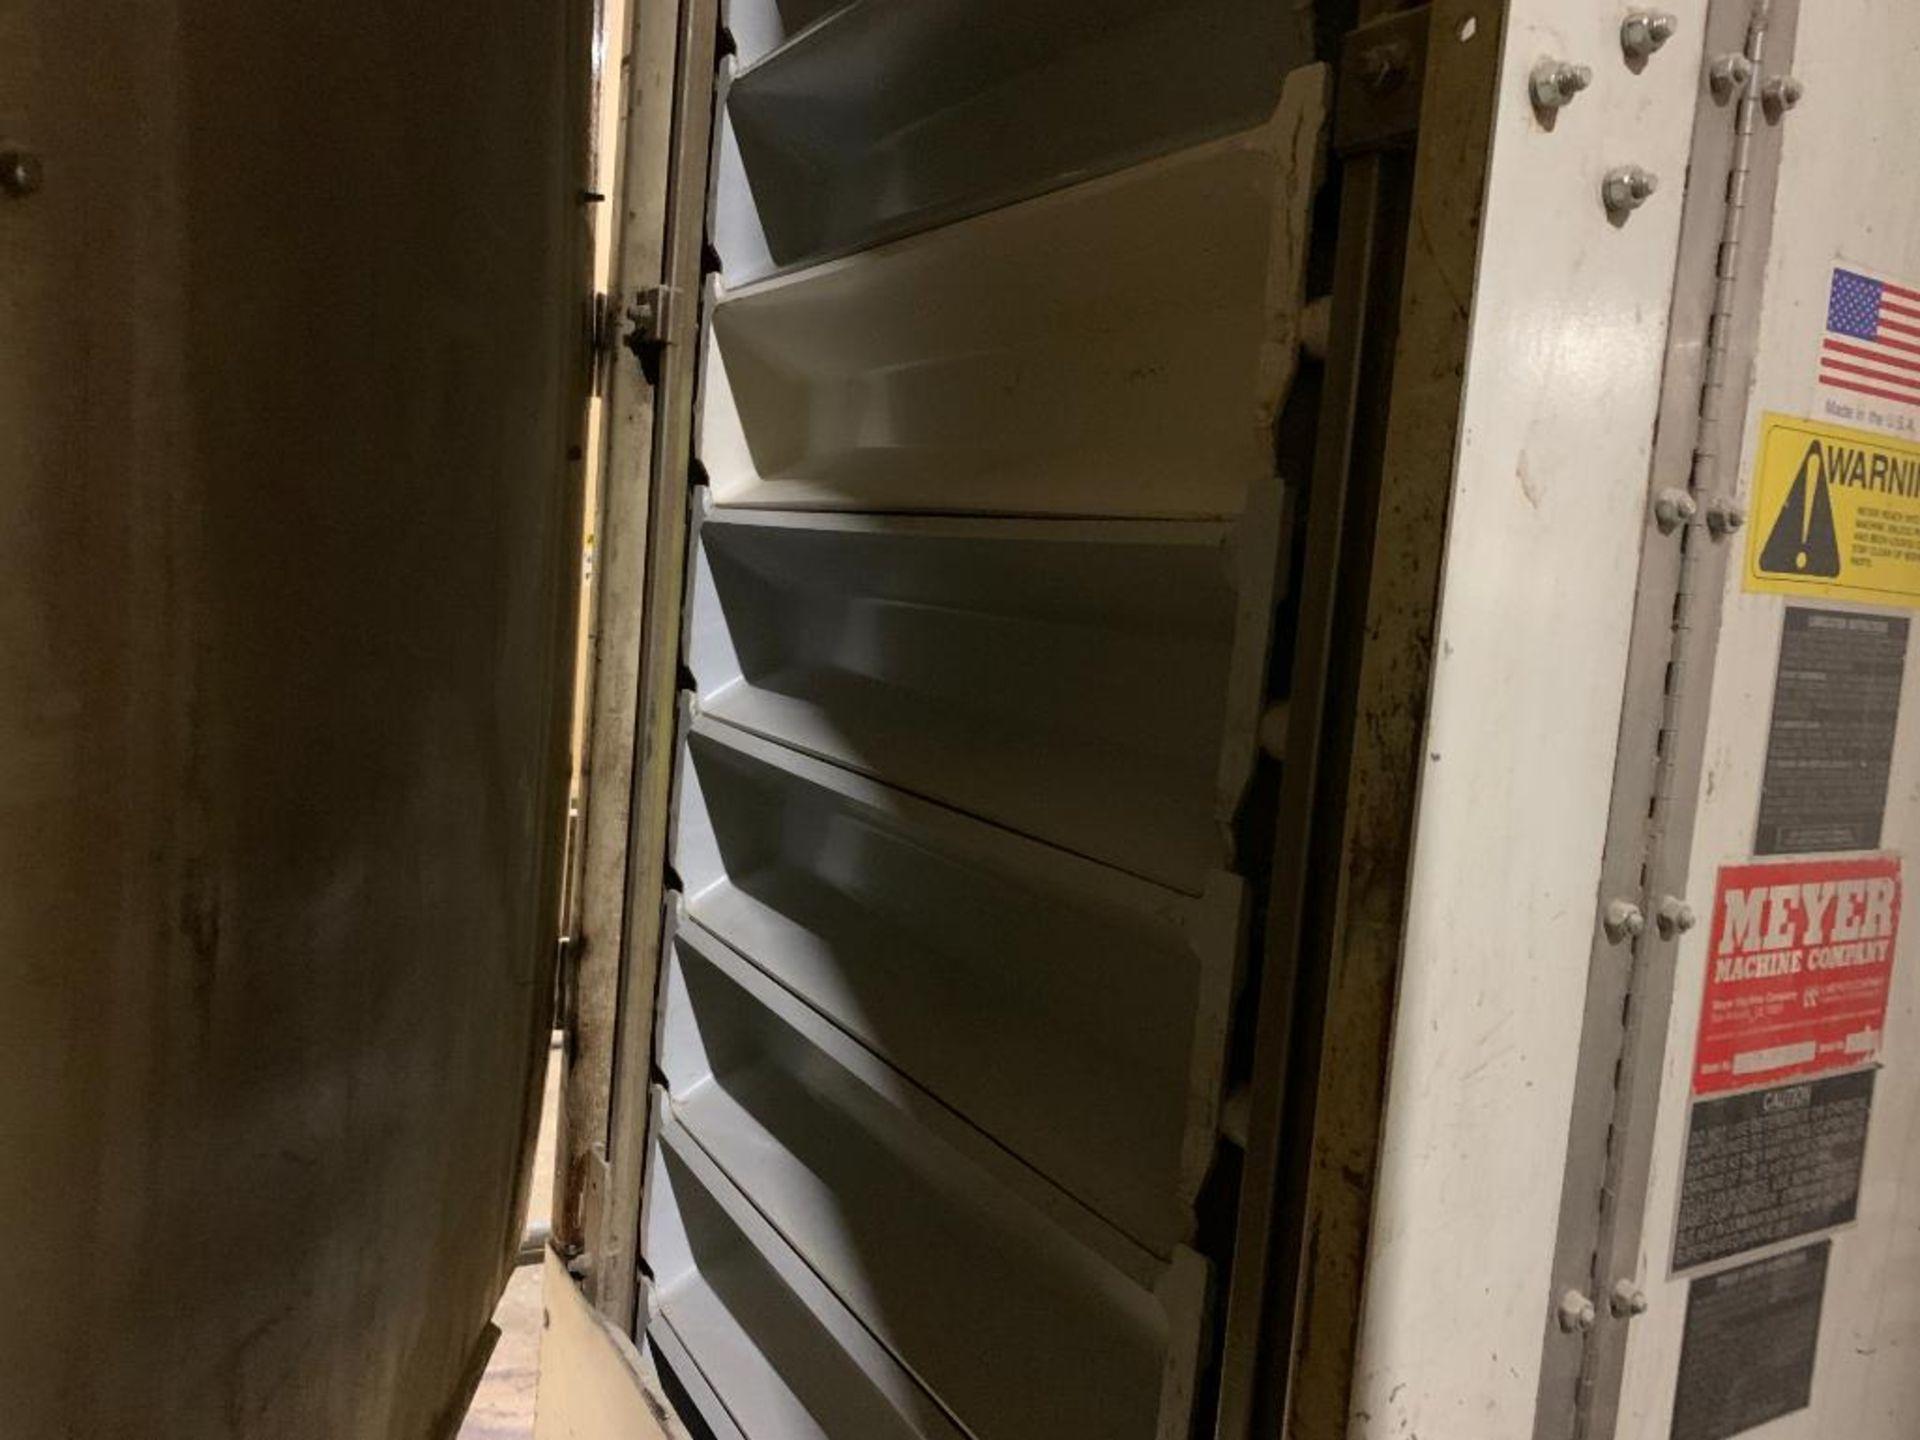 Meyer overlapping bucket elevator, model PA462-24-S - Image 7 of 13